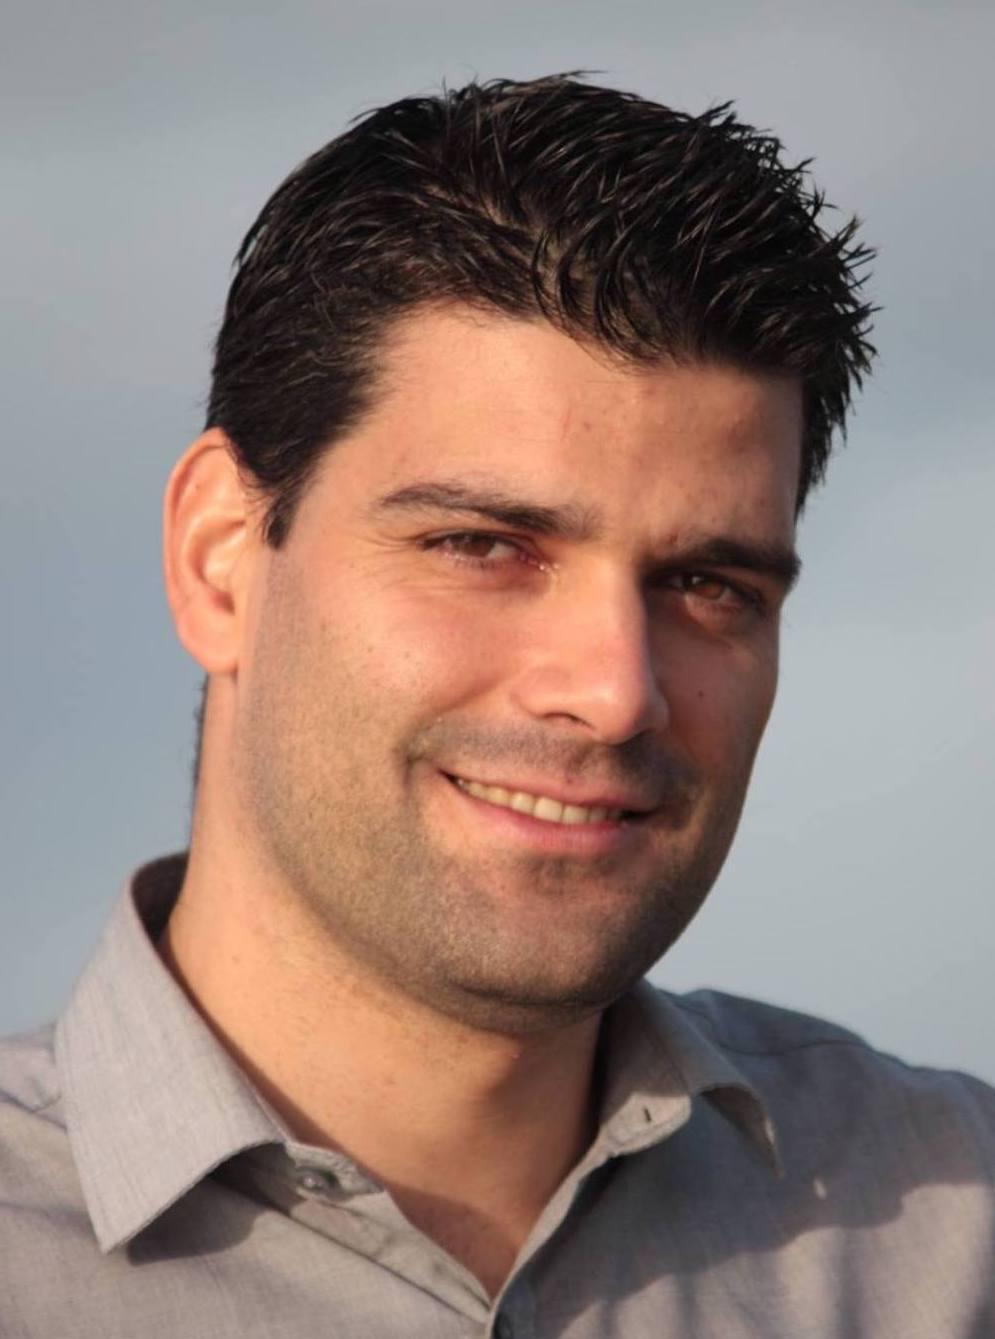 Ricardo Manuel Nunes Lourenço